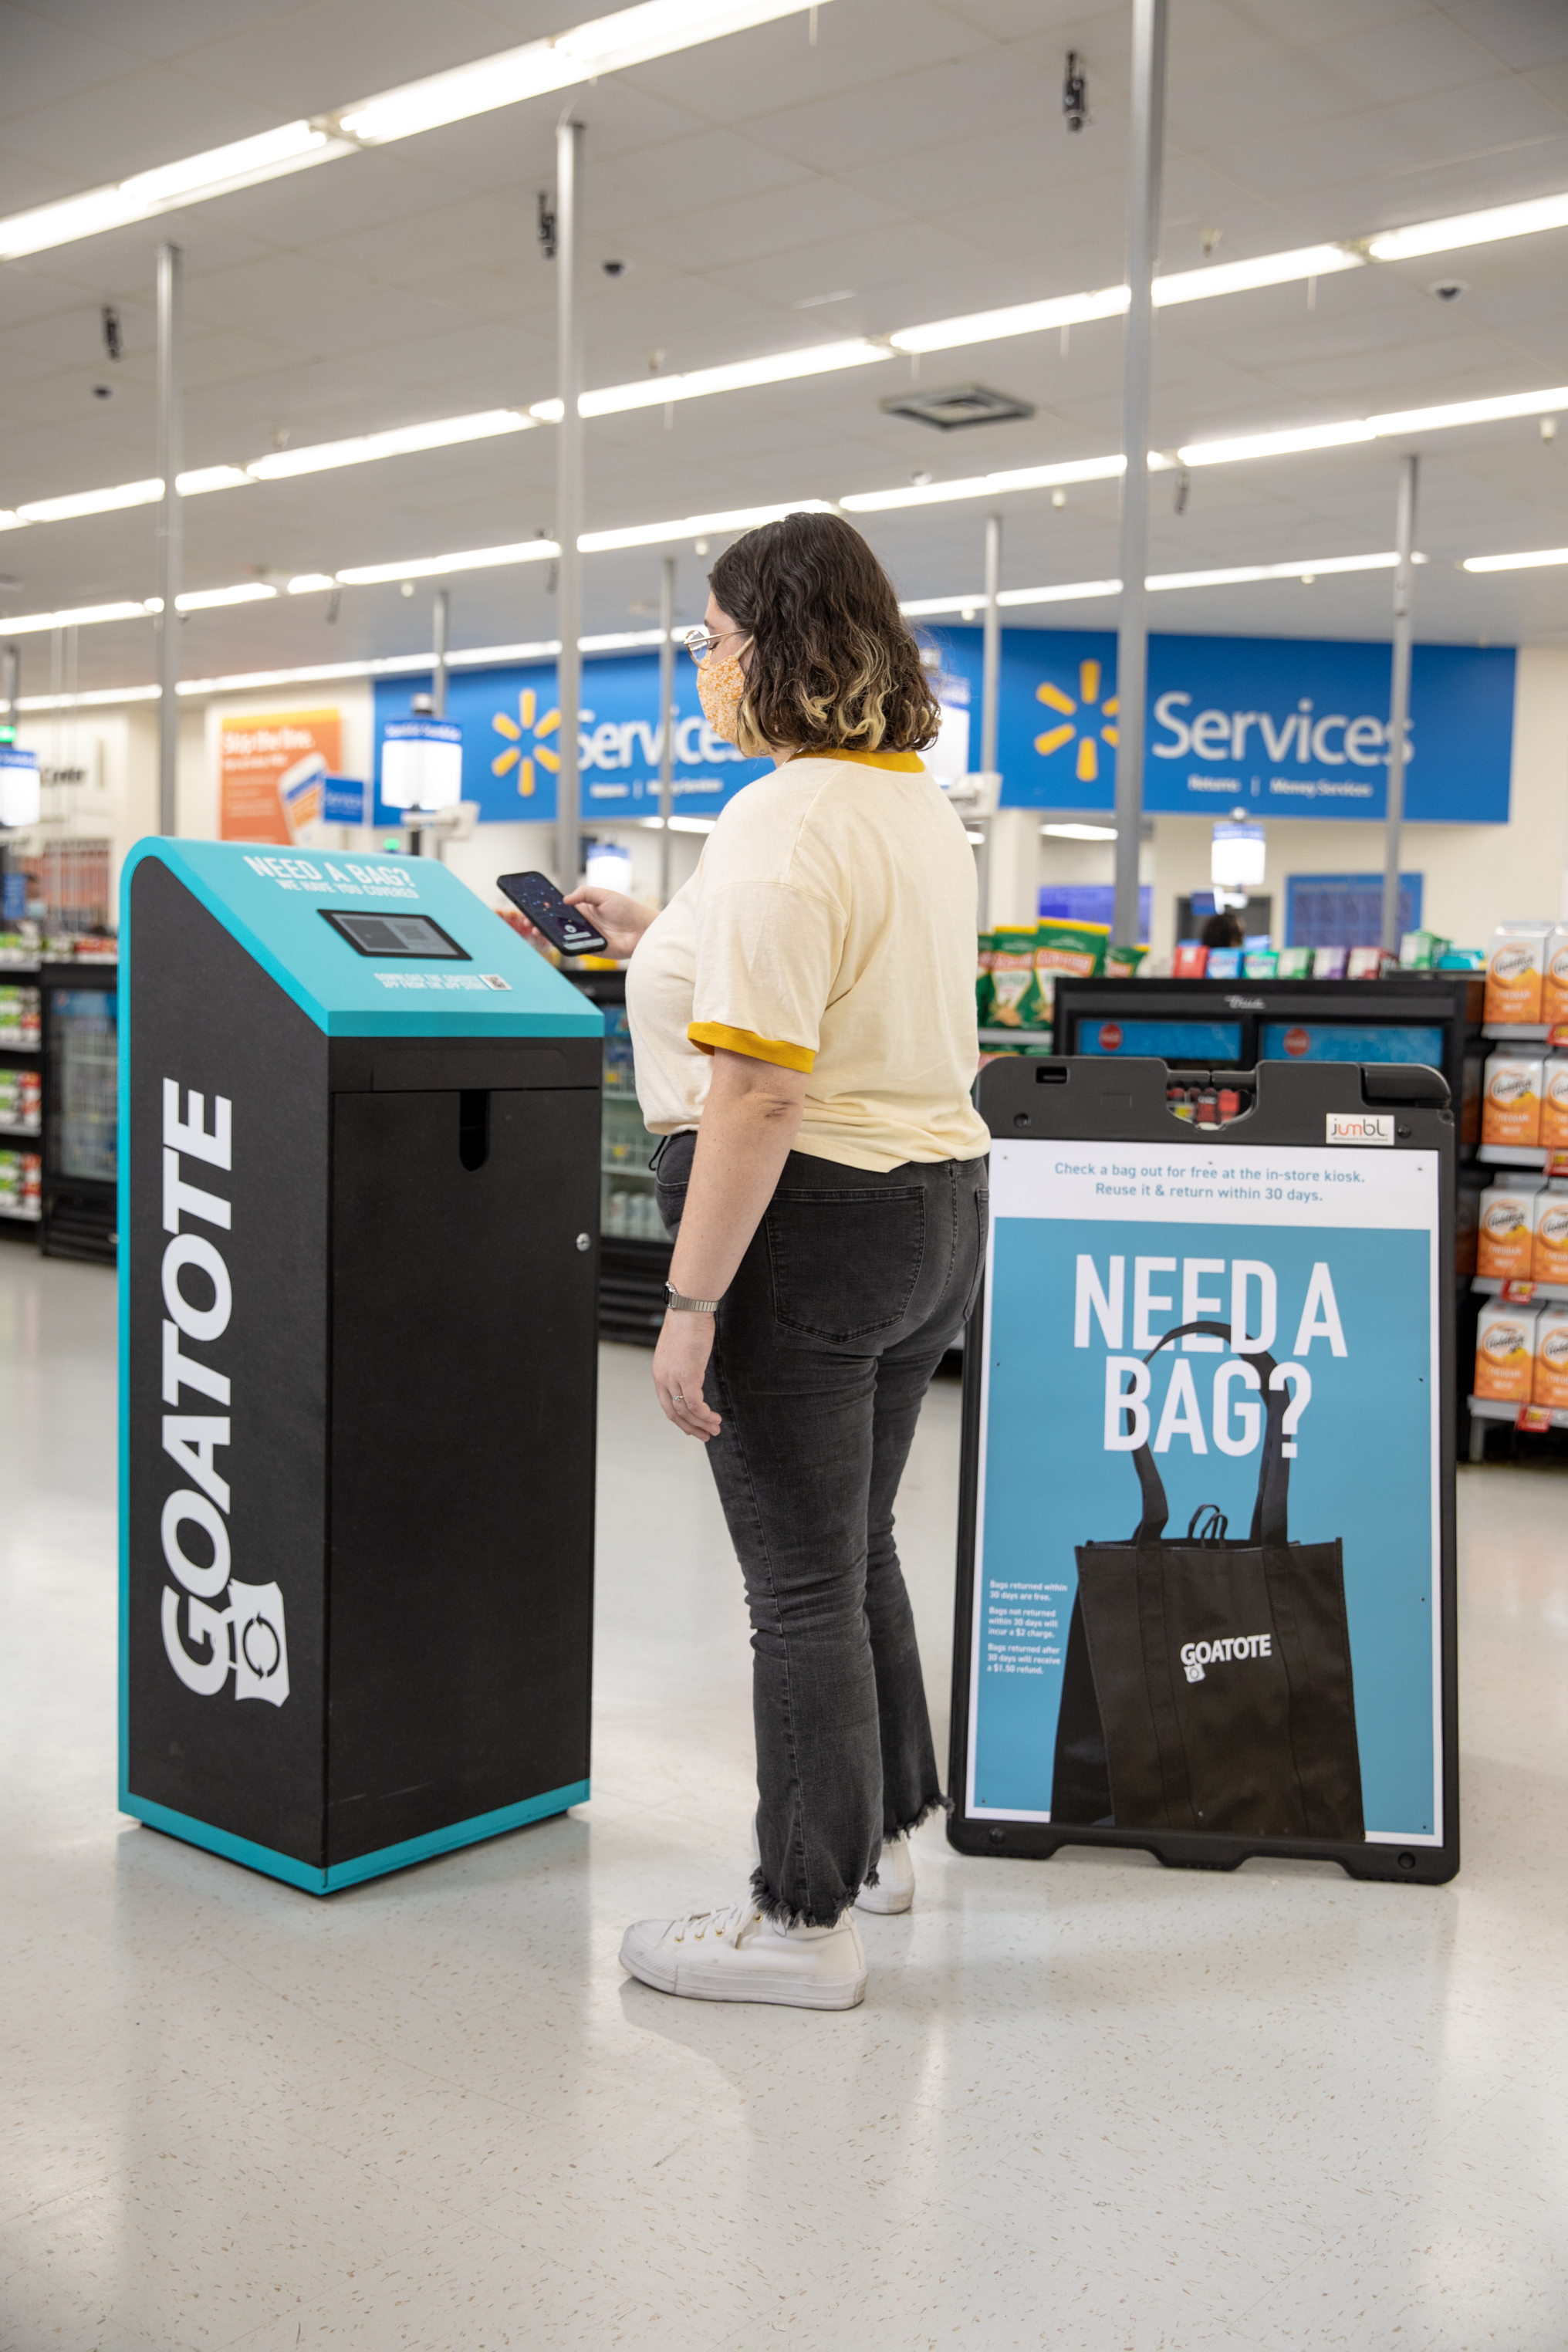 GOATOTE kiosk in Walmart store